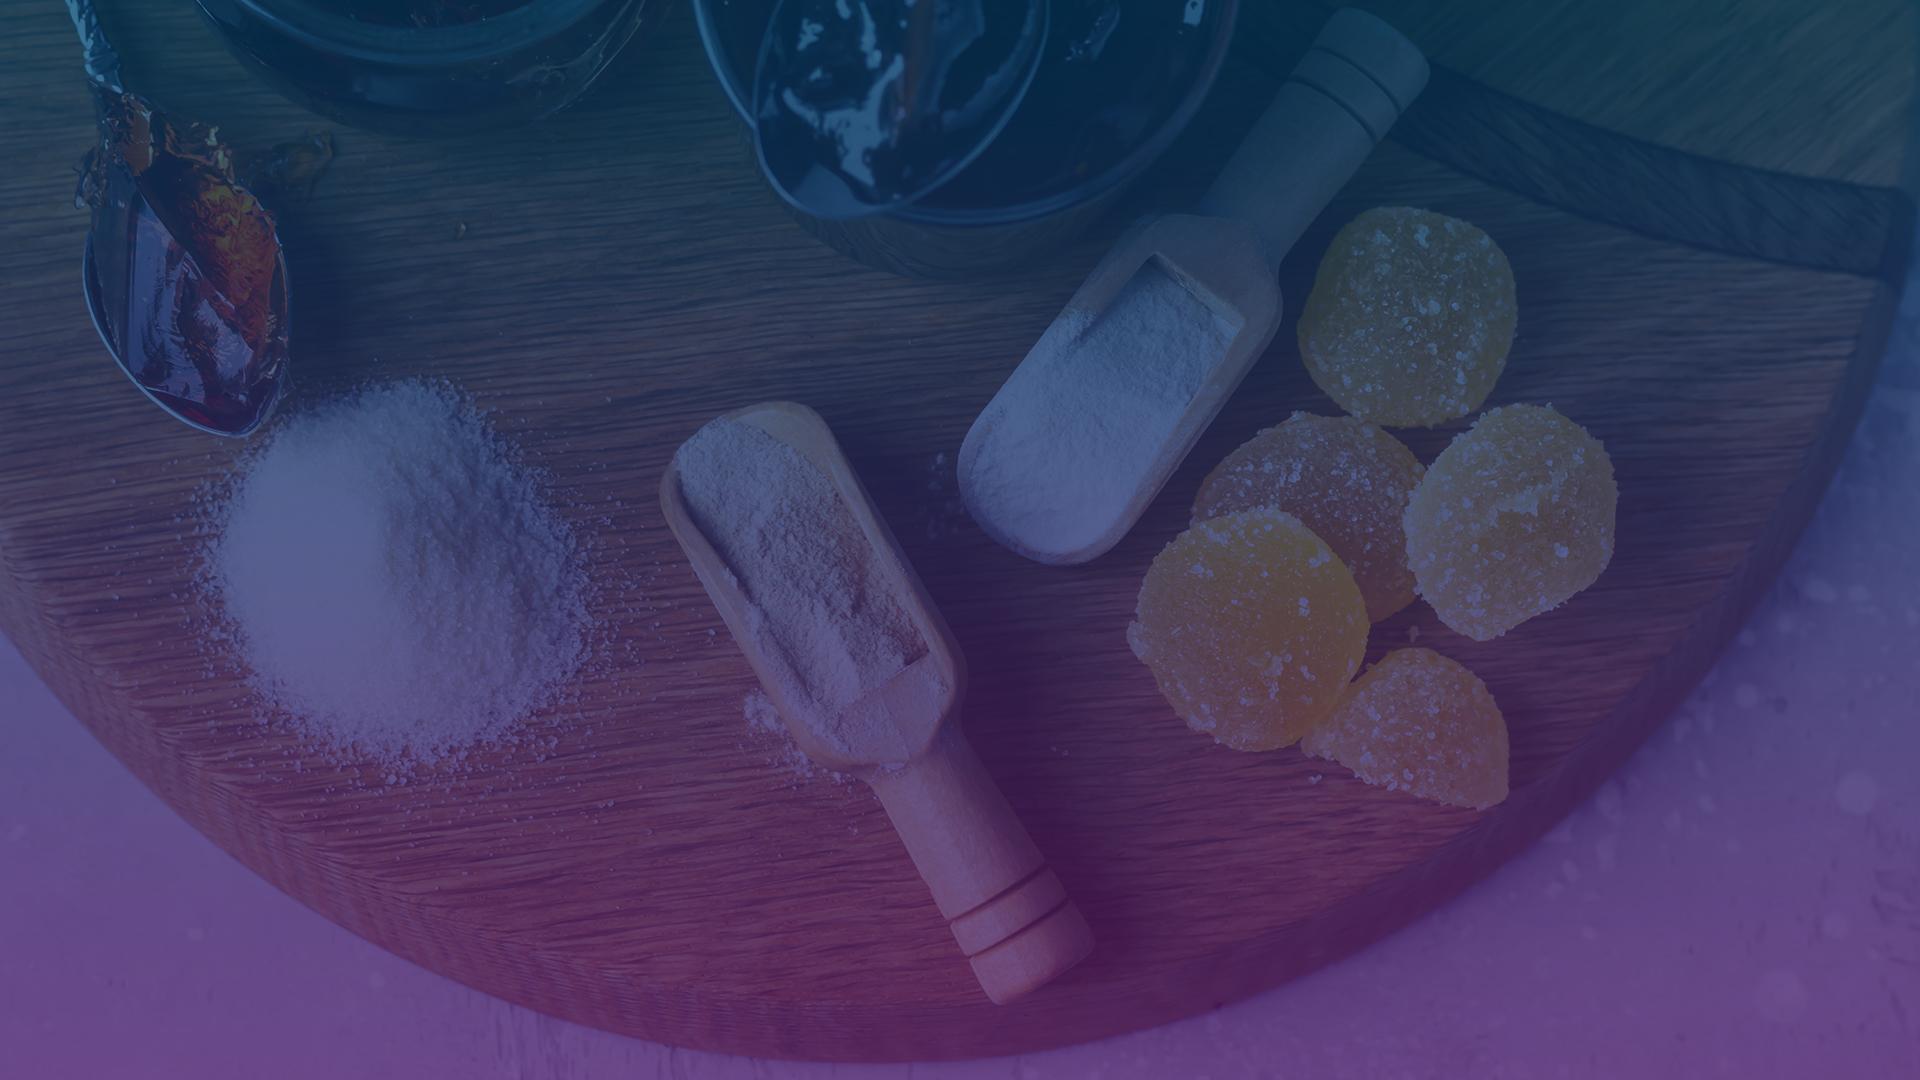 gelotto-gelatin-home-main-image2